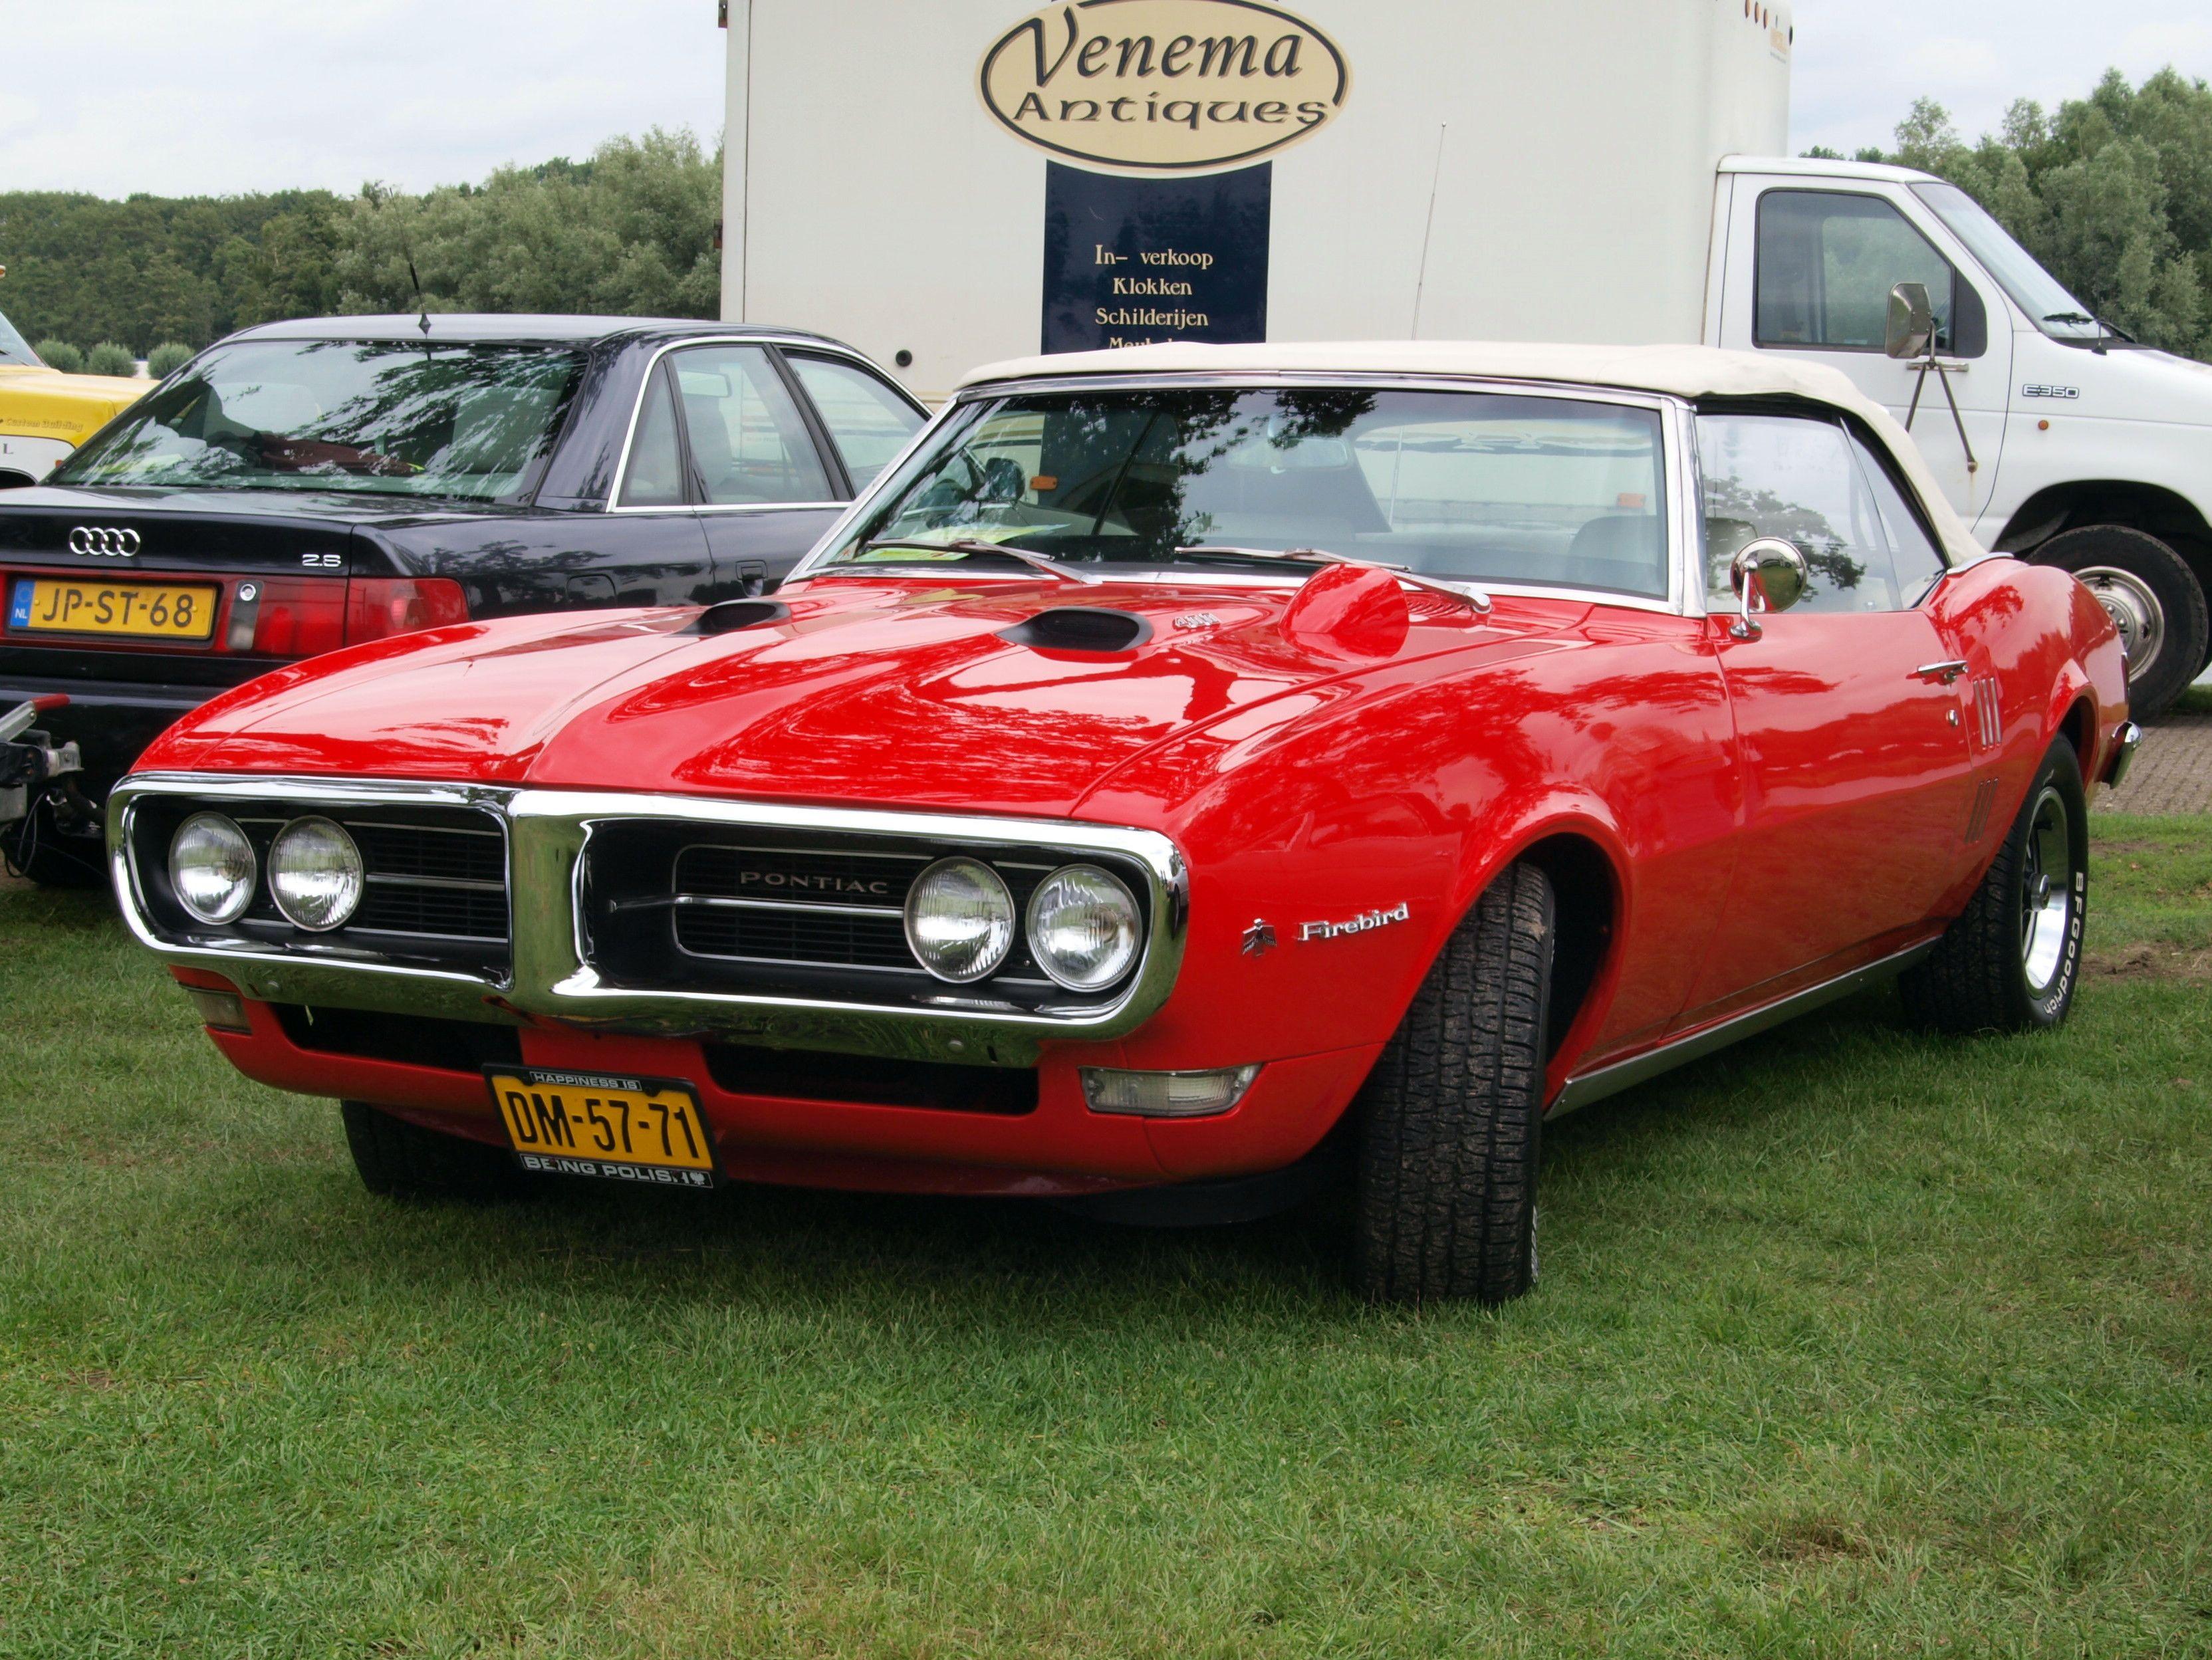 1968 Pontiac Firebird convertible 400 Ram Air with the optional